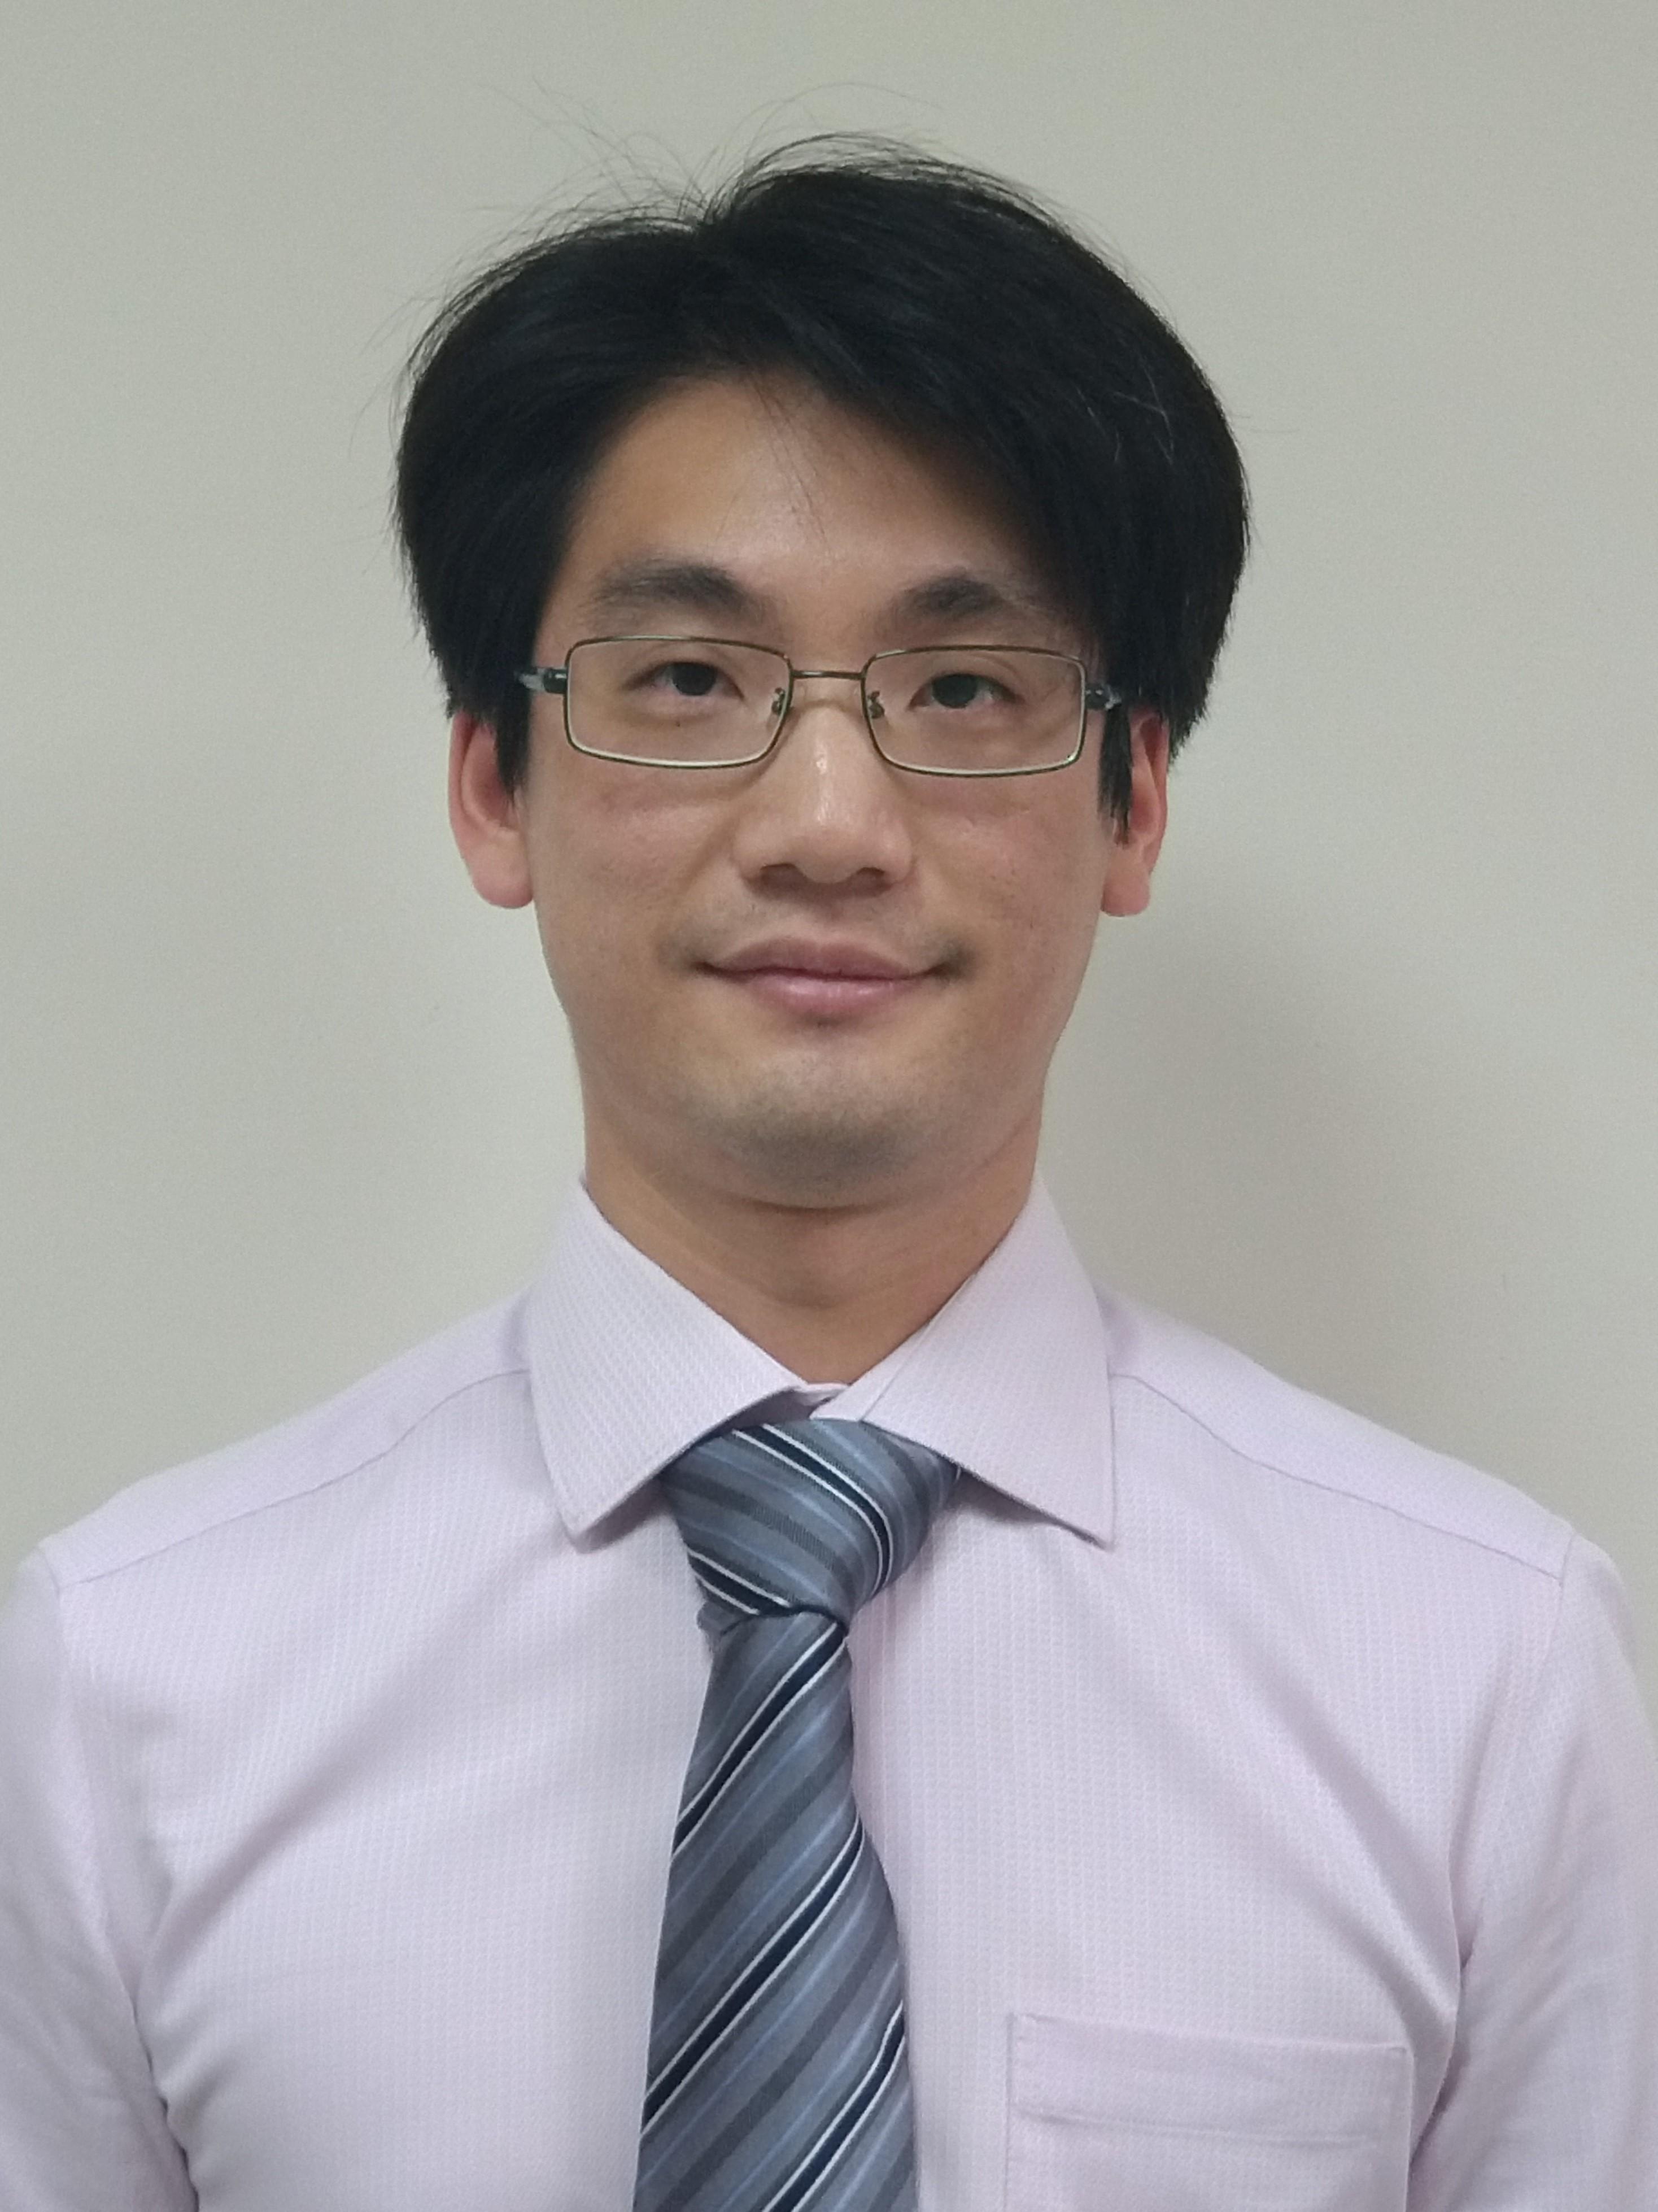 Award Recipients|Research Fellowship|English|日本消化器病学会